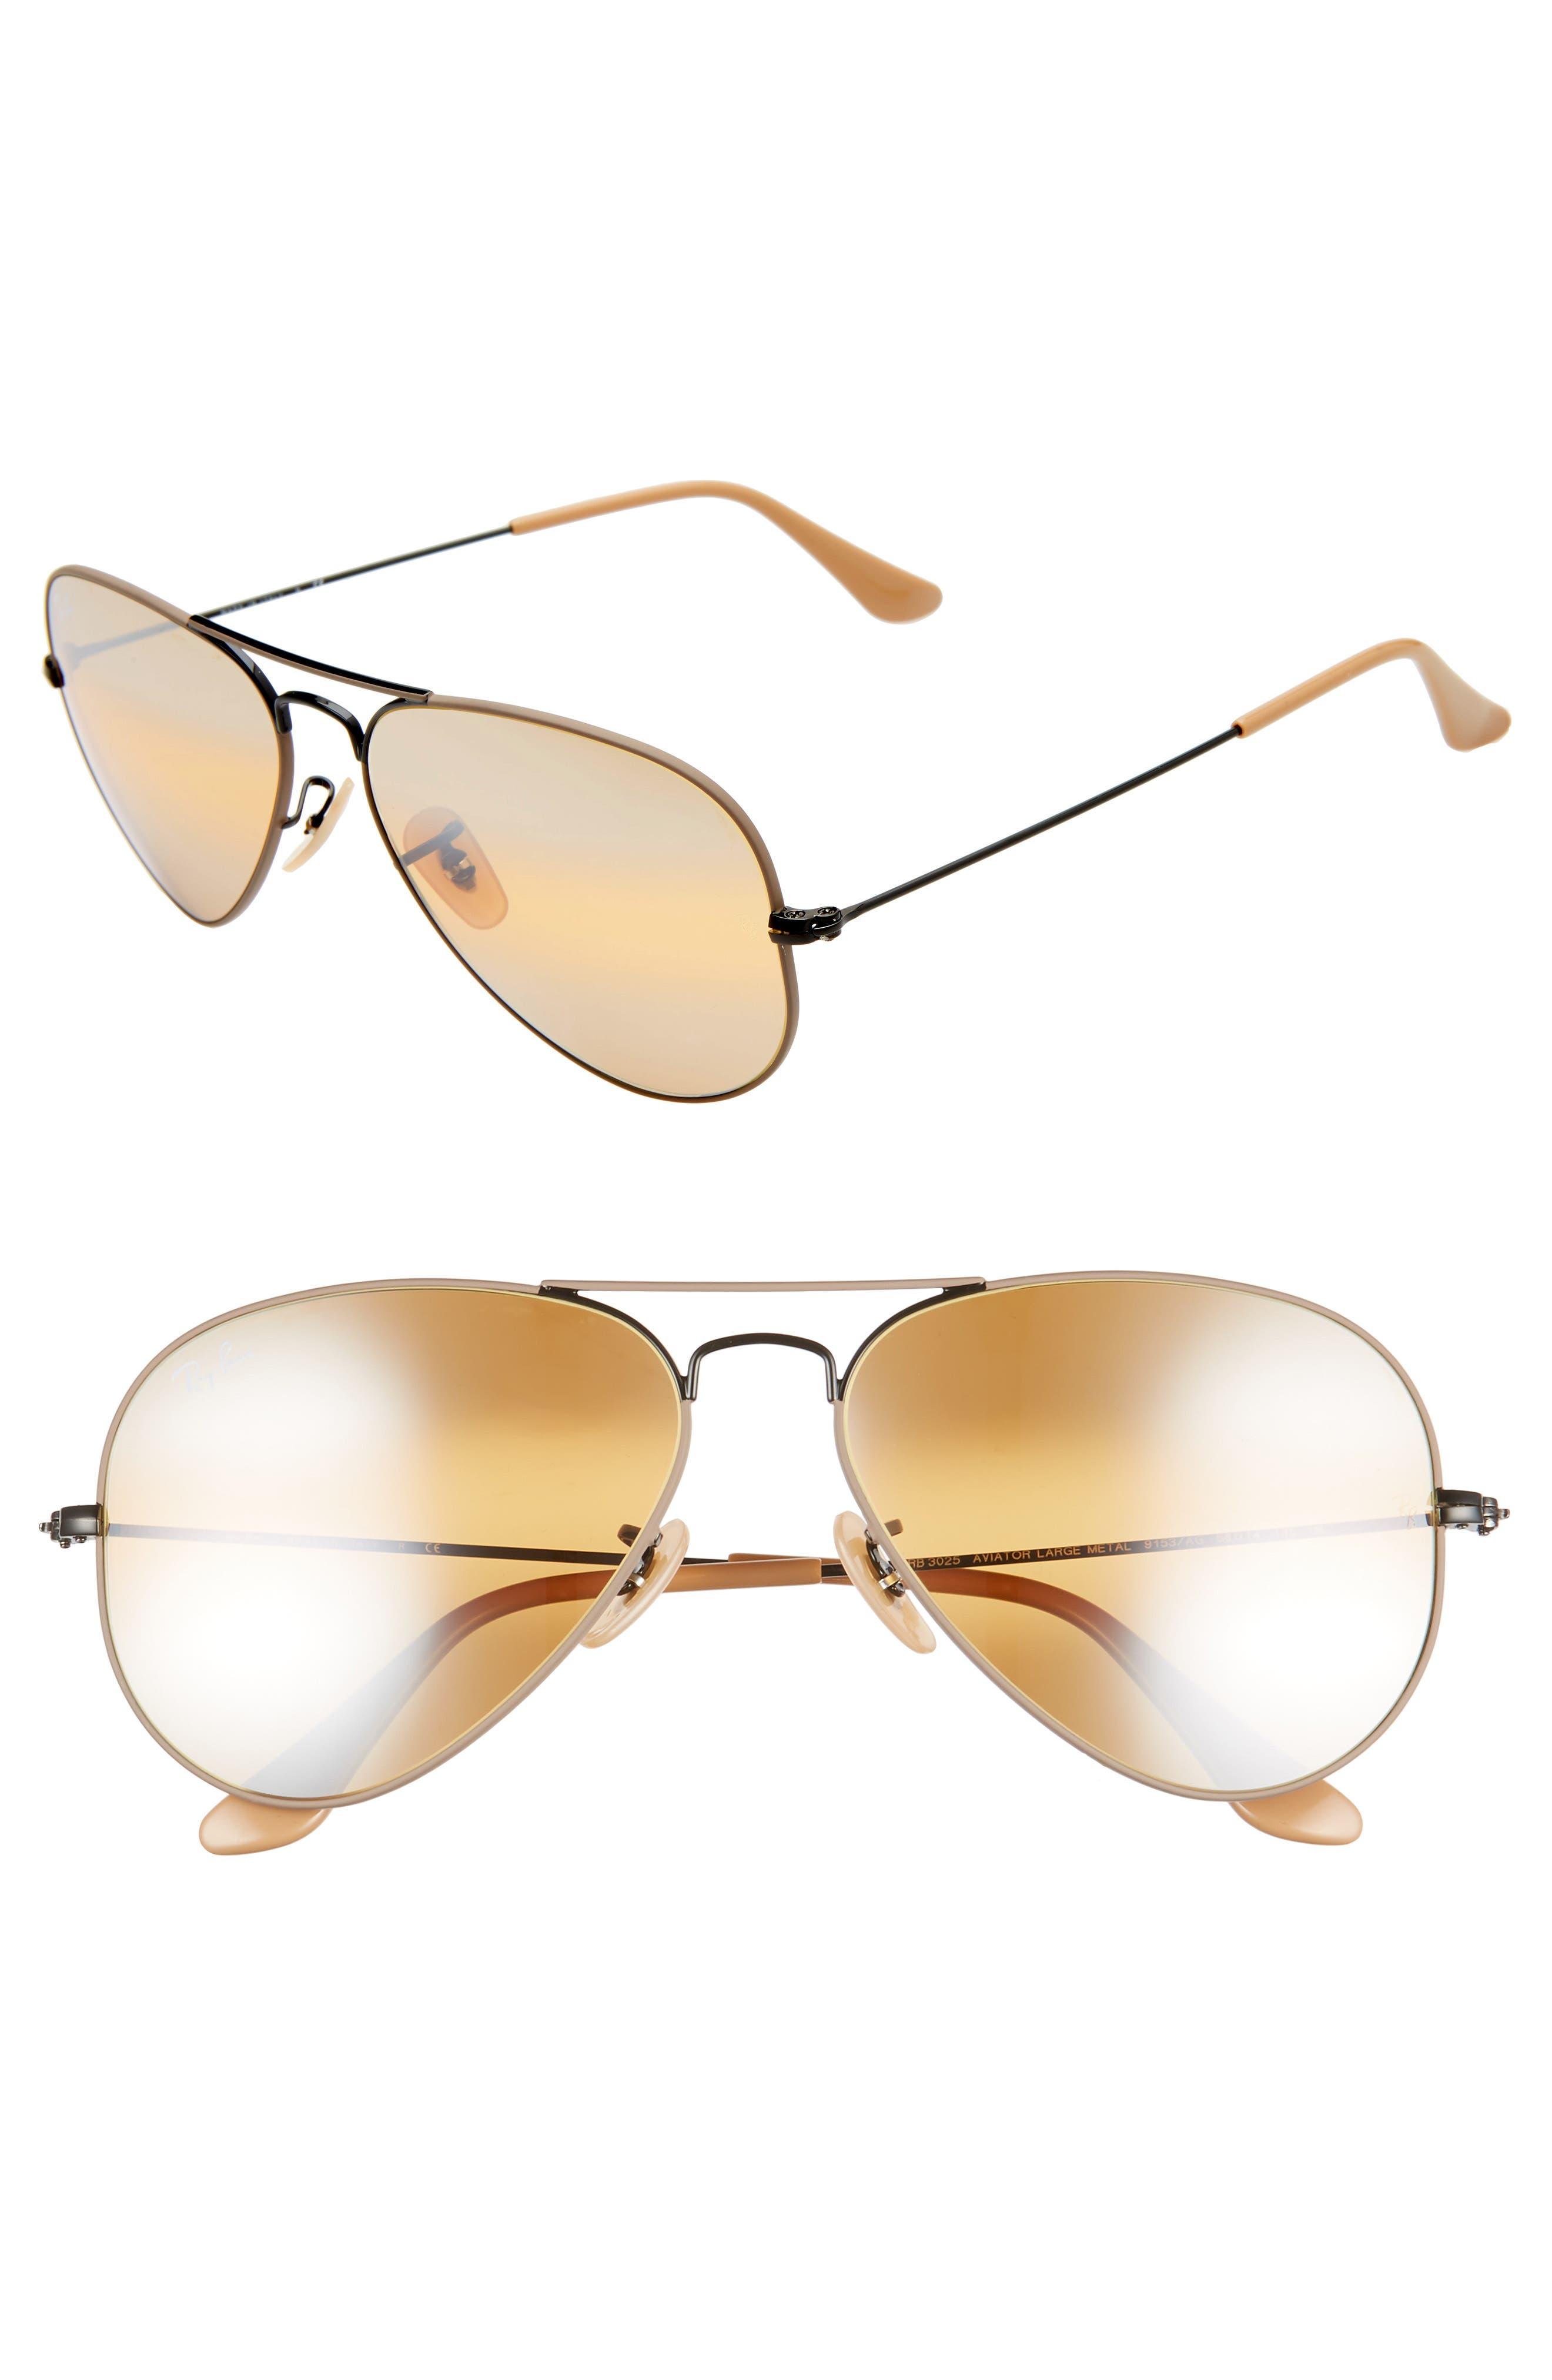 Standard Original 58mm Aviator Sunglasses, Main, color, BEIGE/ BLACK MIRROR